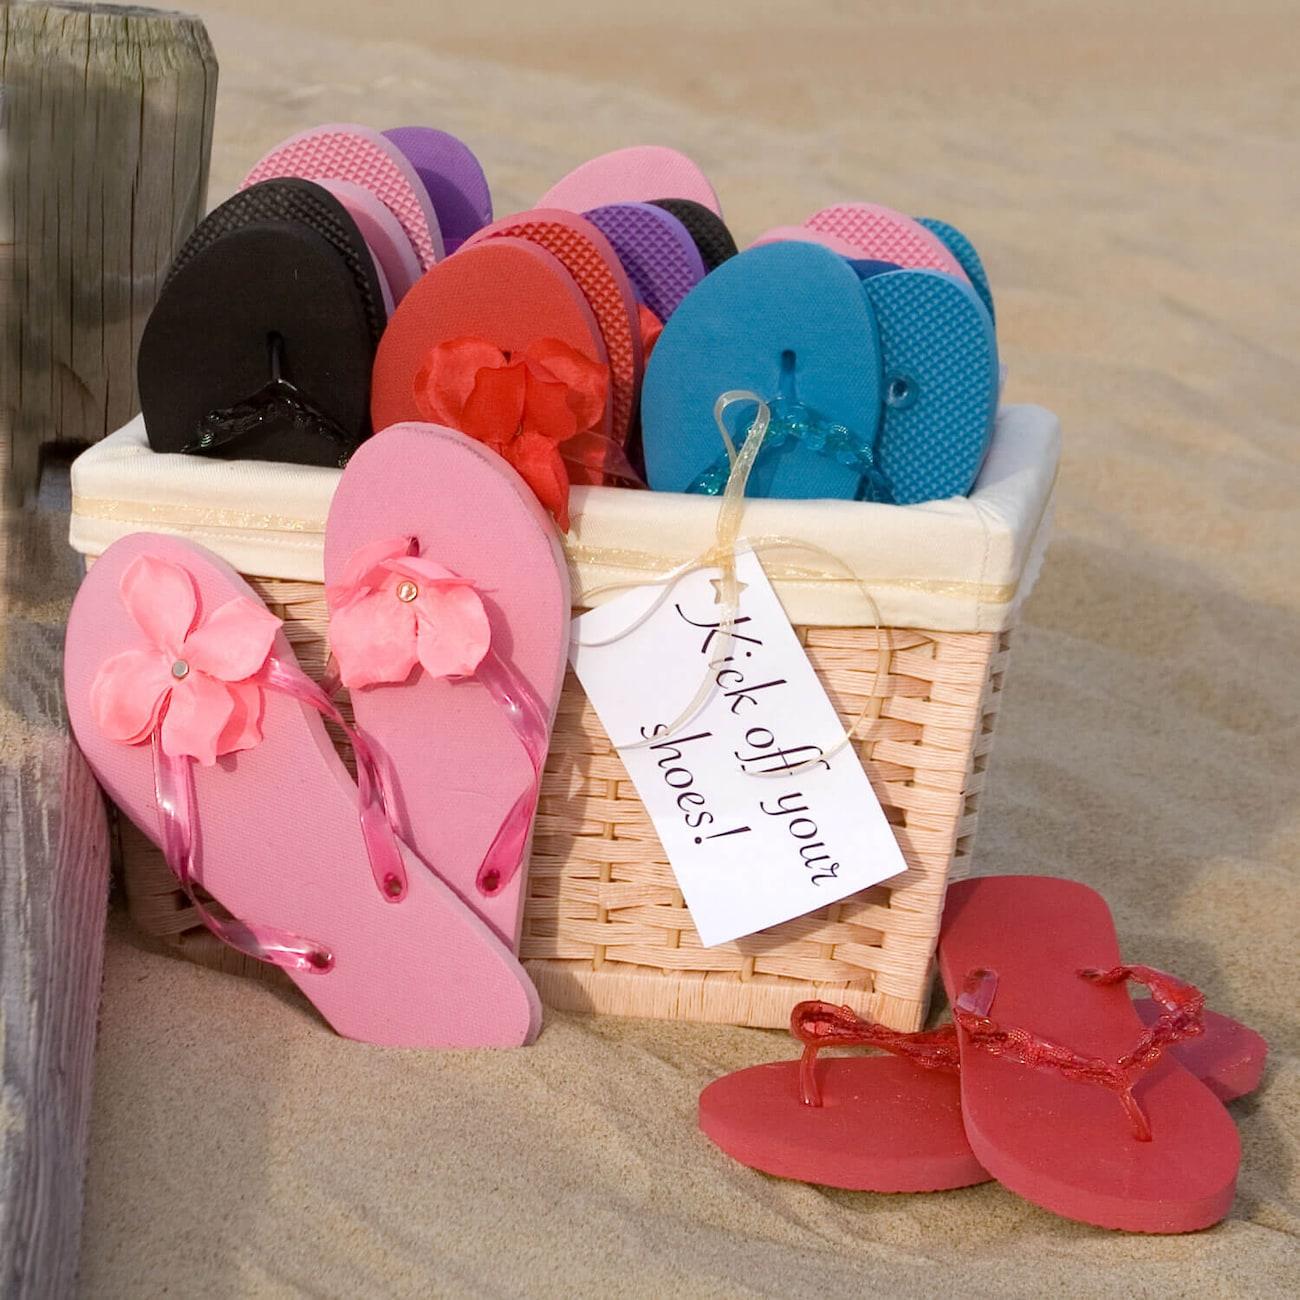 DollarTree.com | Wedding Idea: Flip-Flops for Your Reception